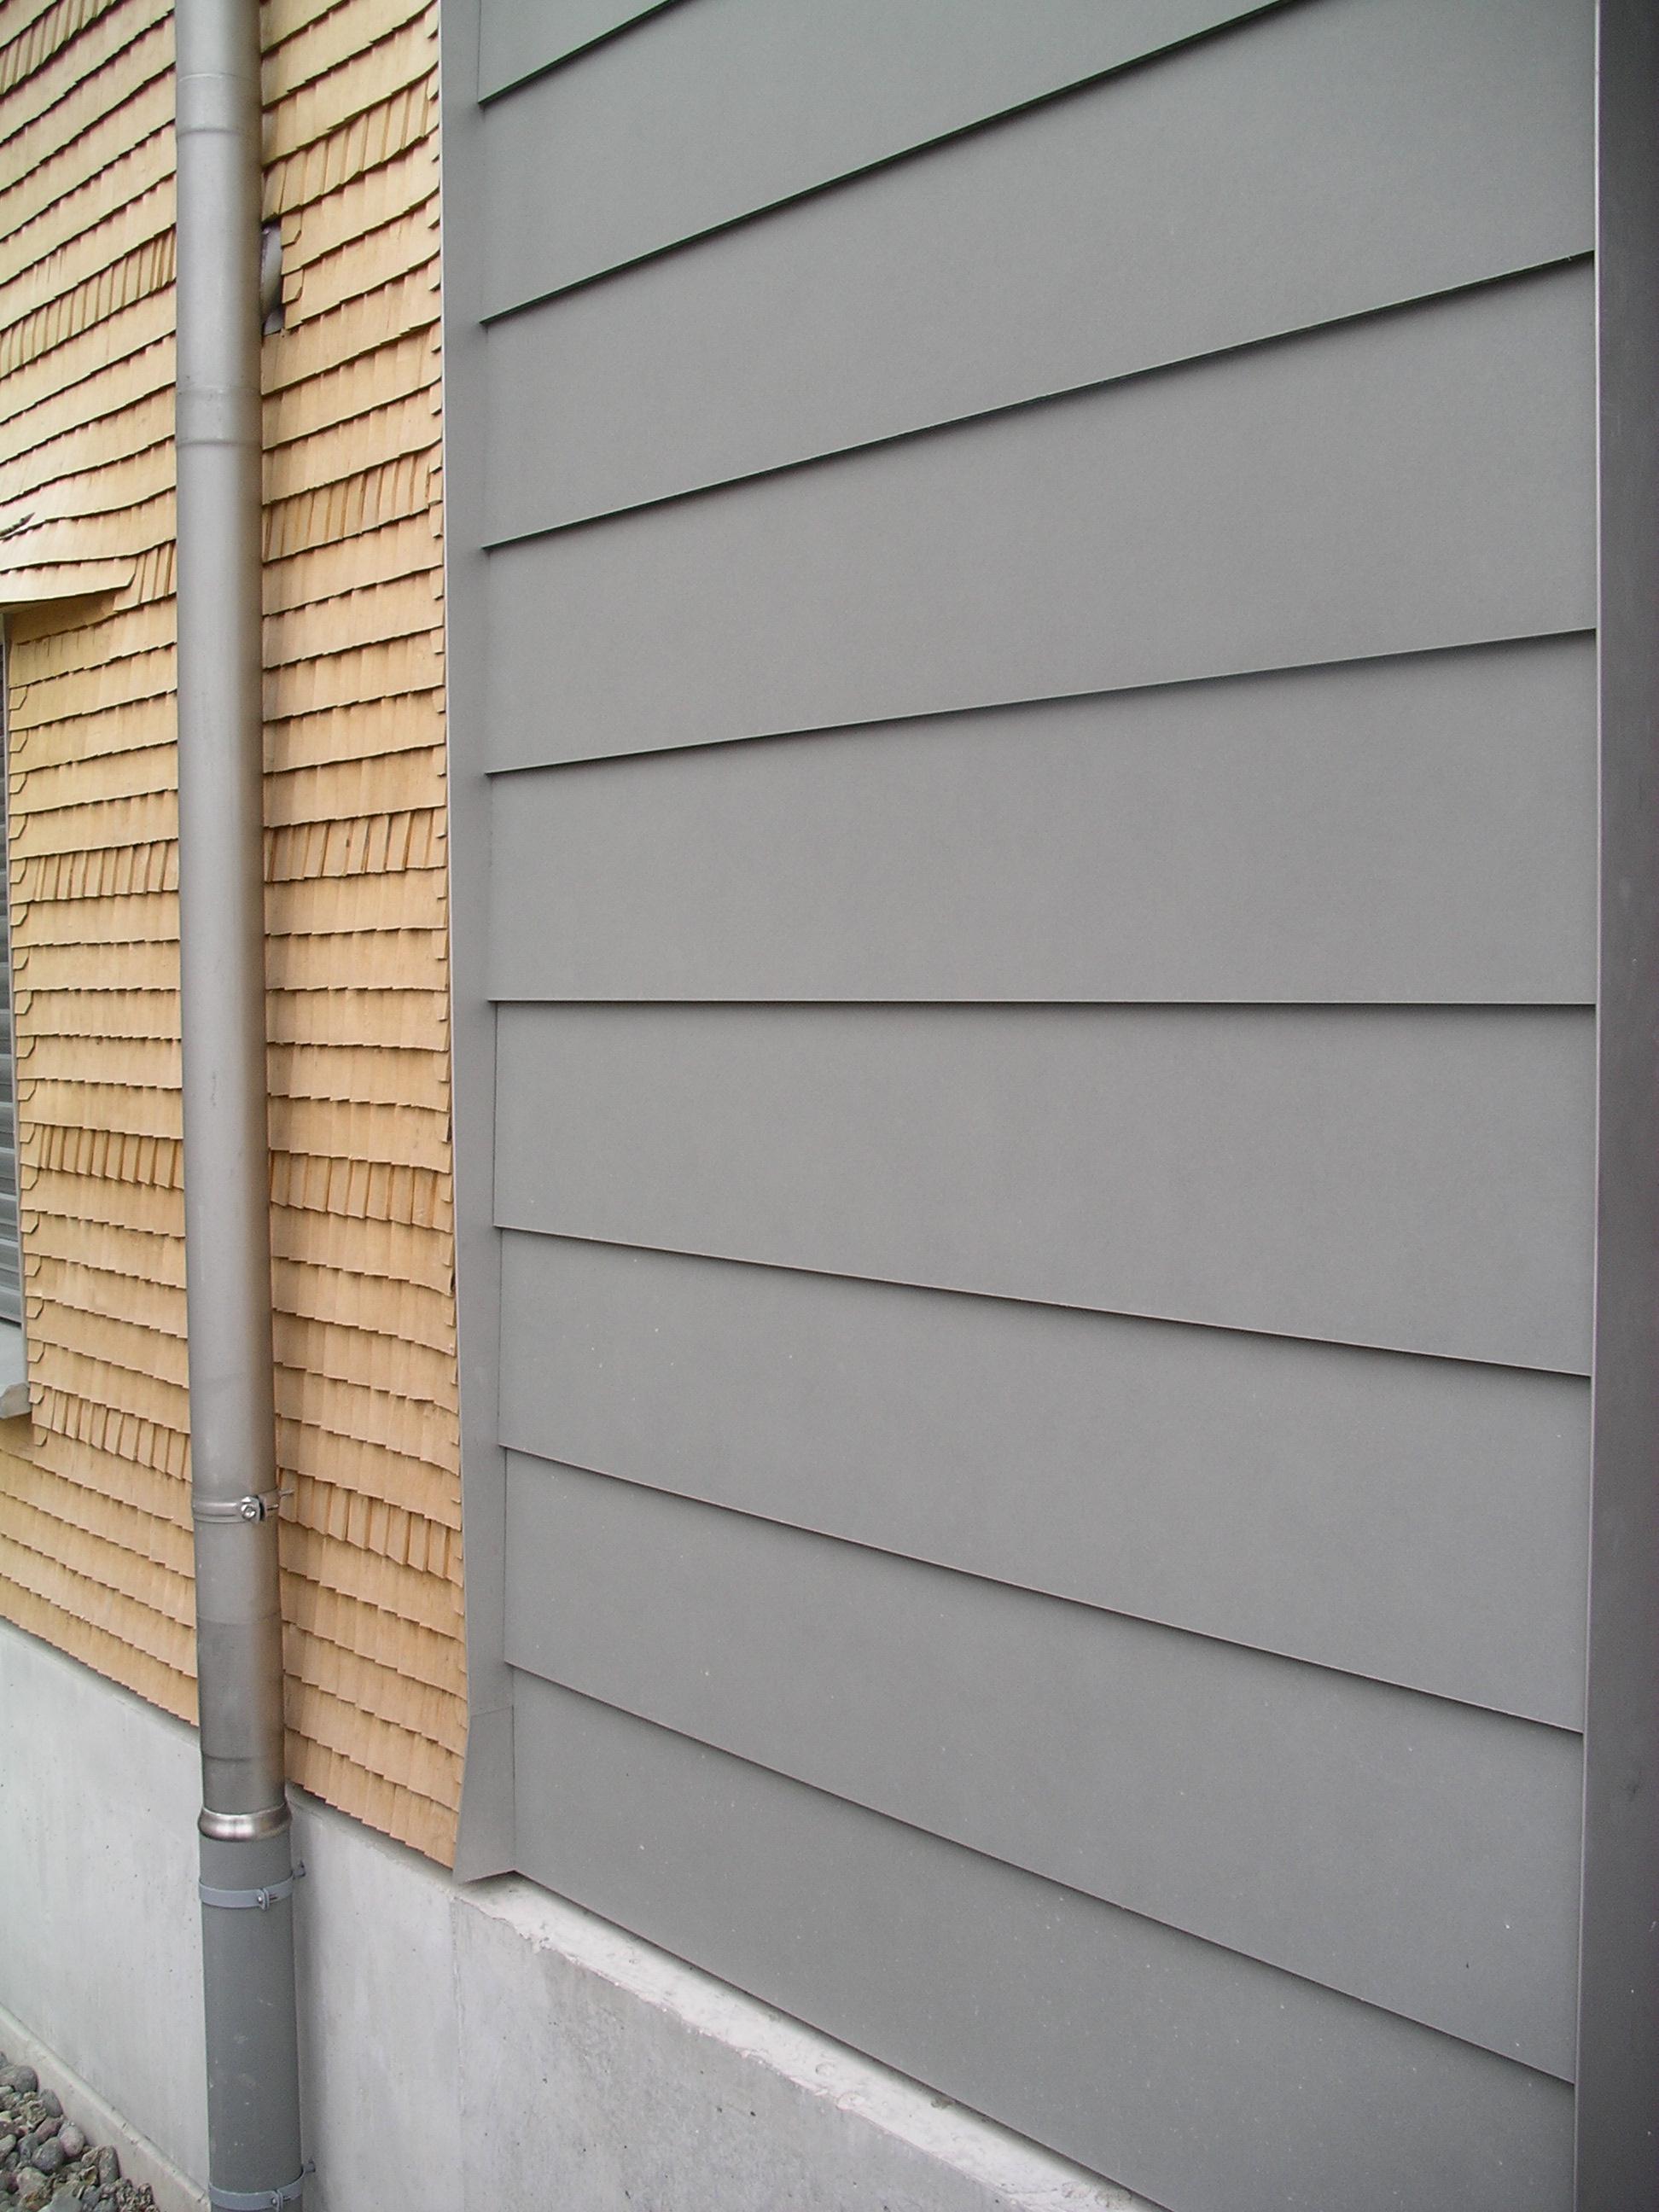 Kombinierte Fassade